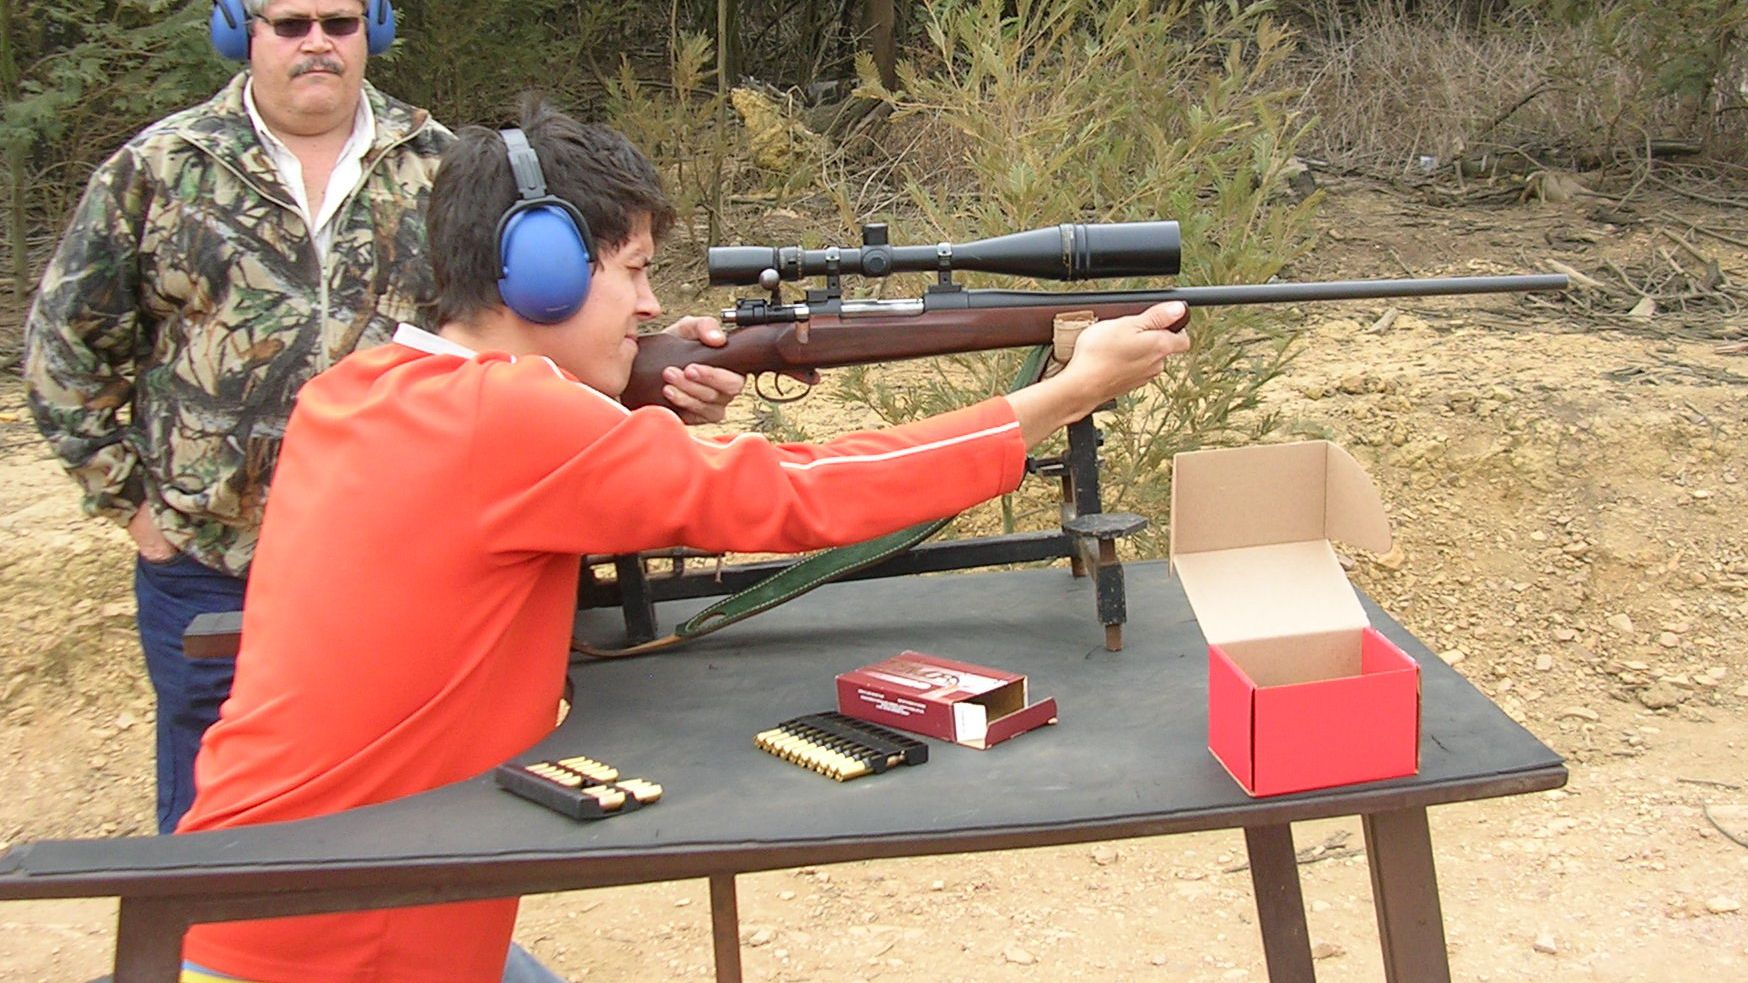 Making Sense of Ohio's Gun Laws